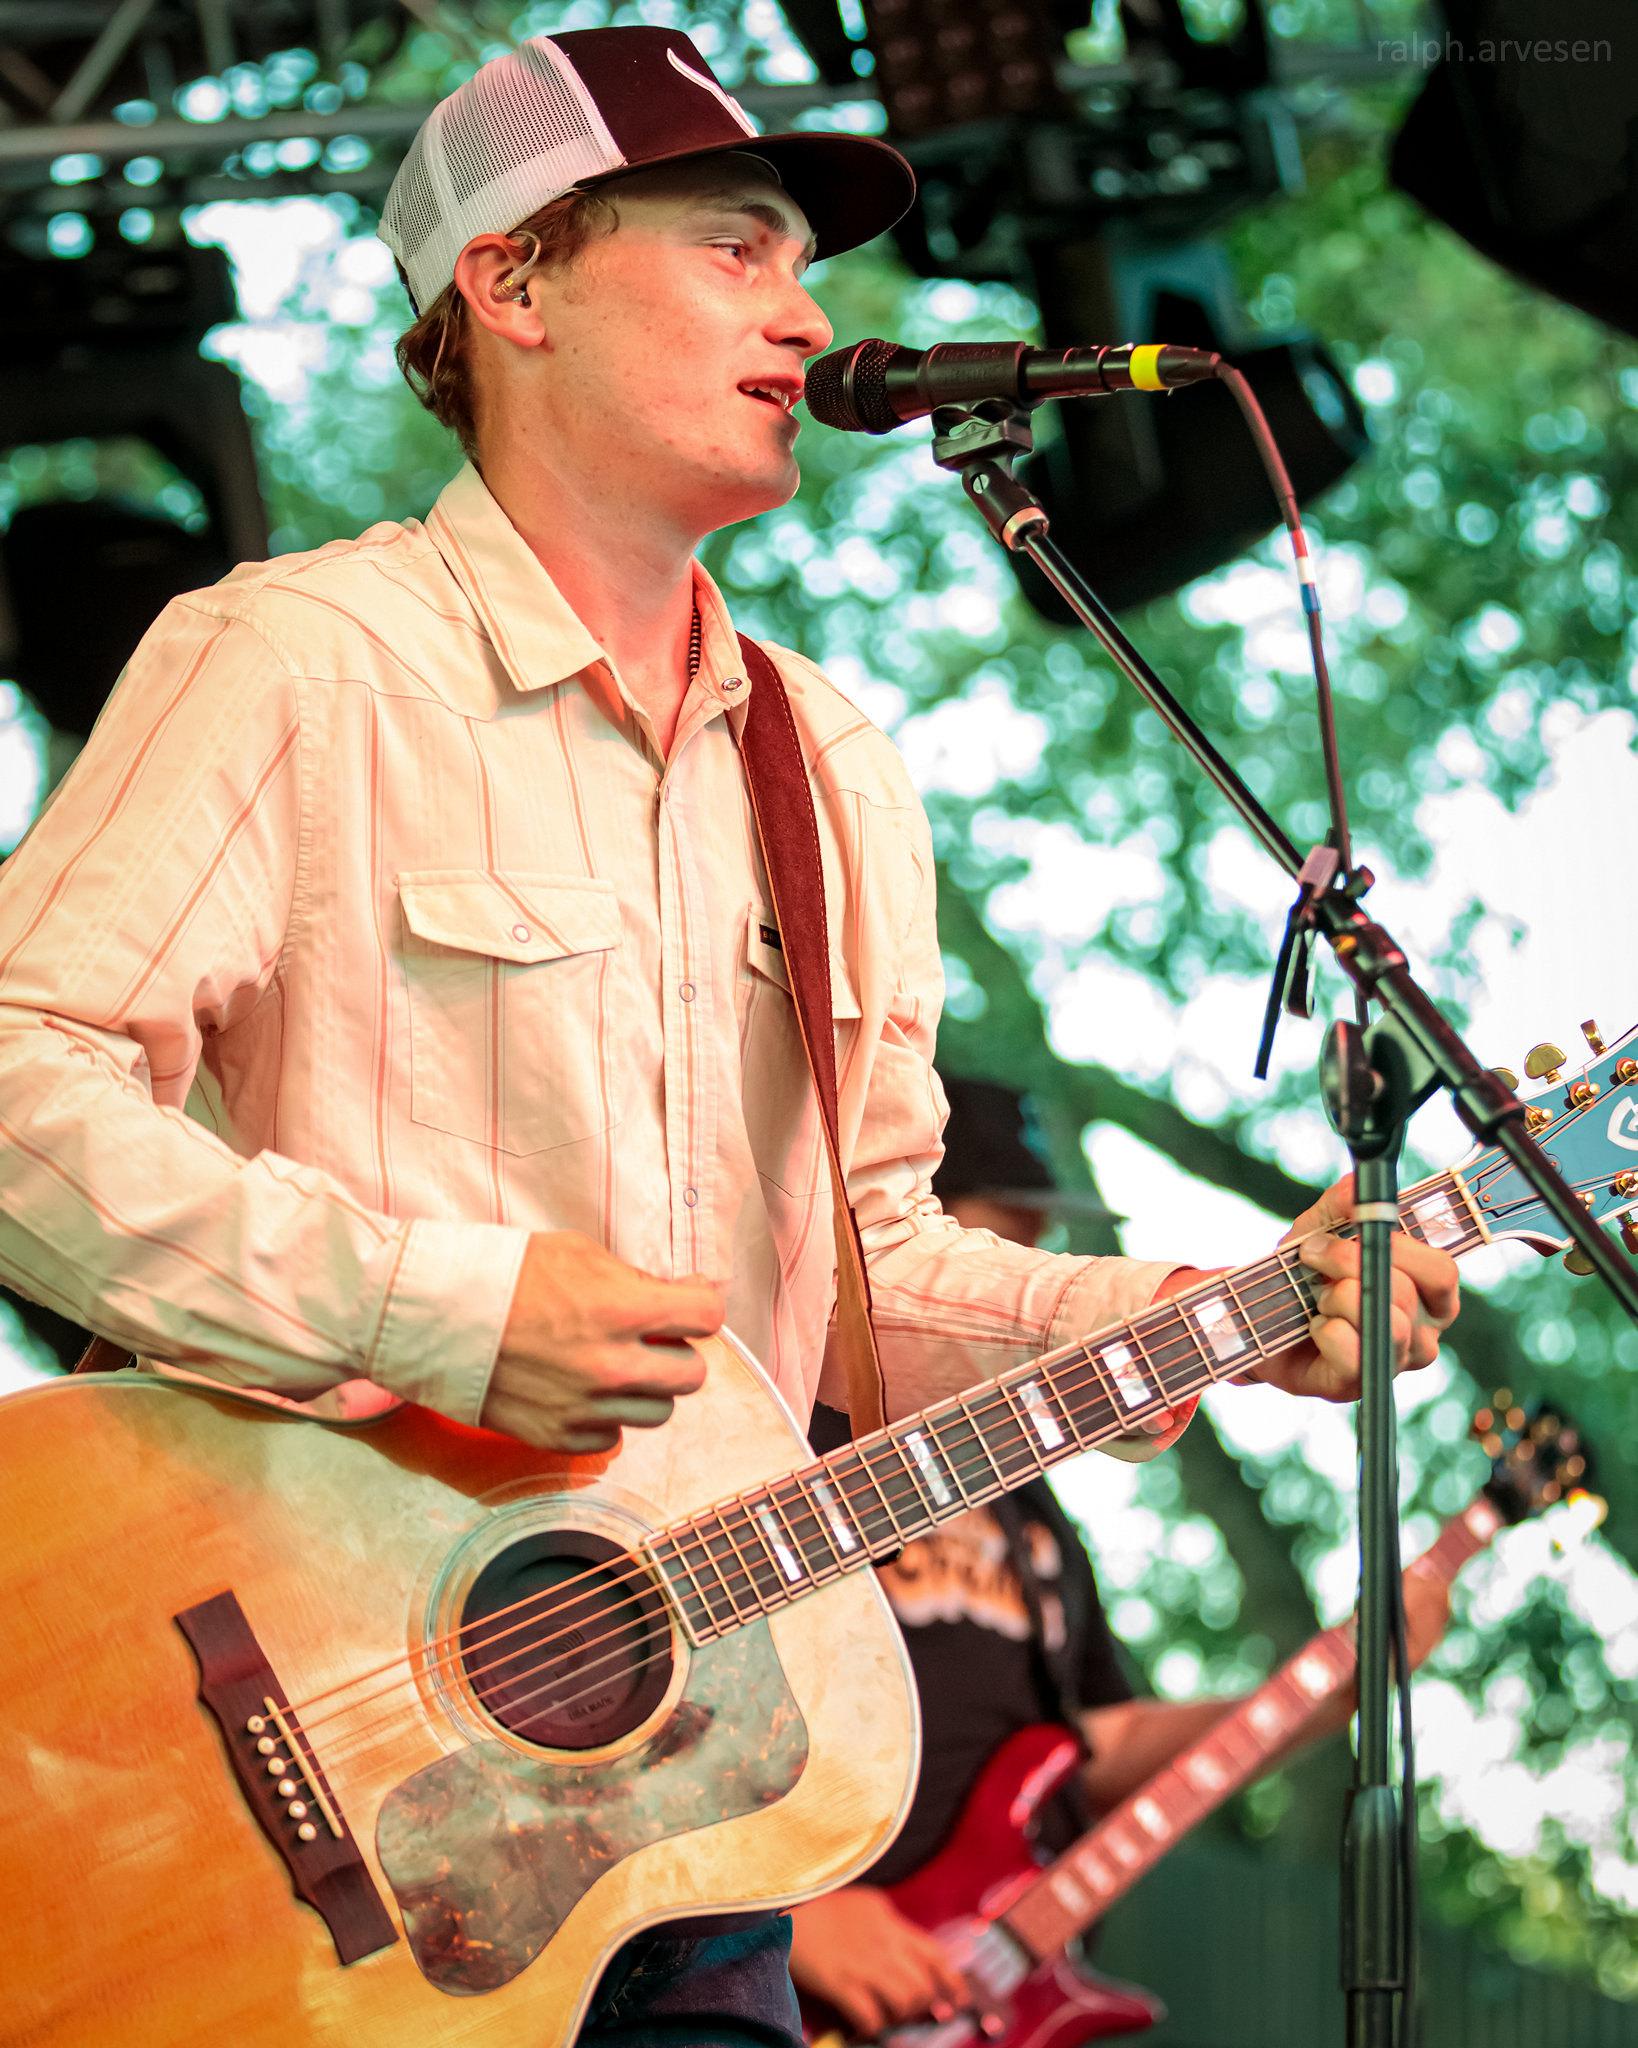 Carson Jeffrey | Texas Review | Ralph Arvesen